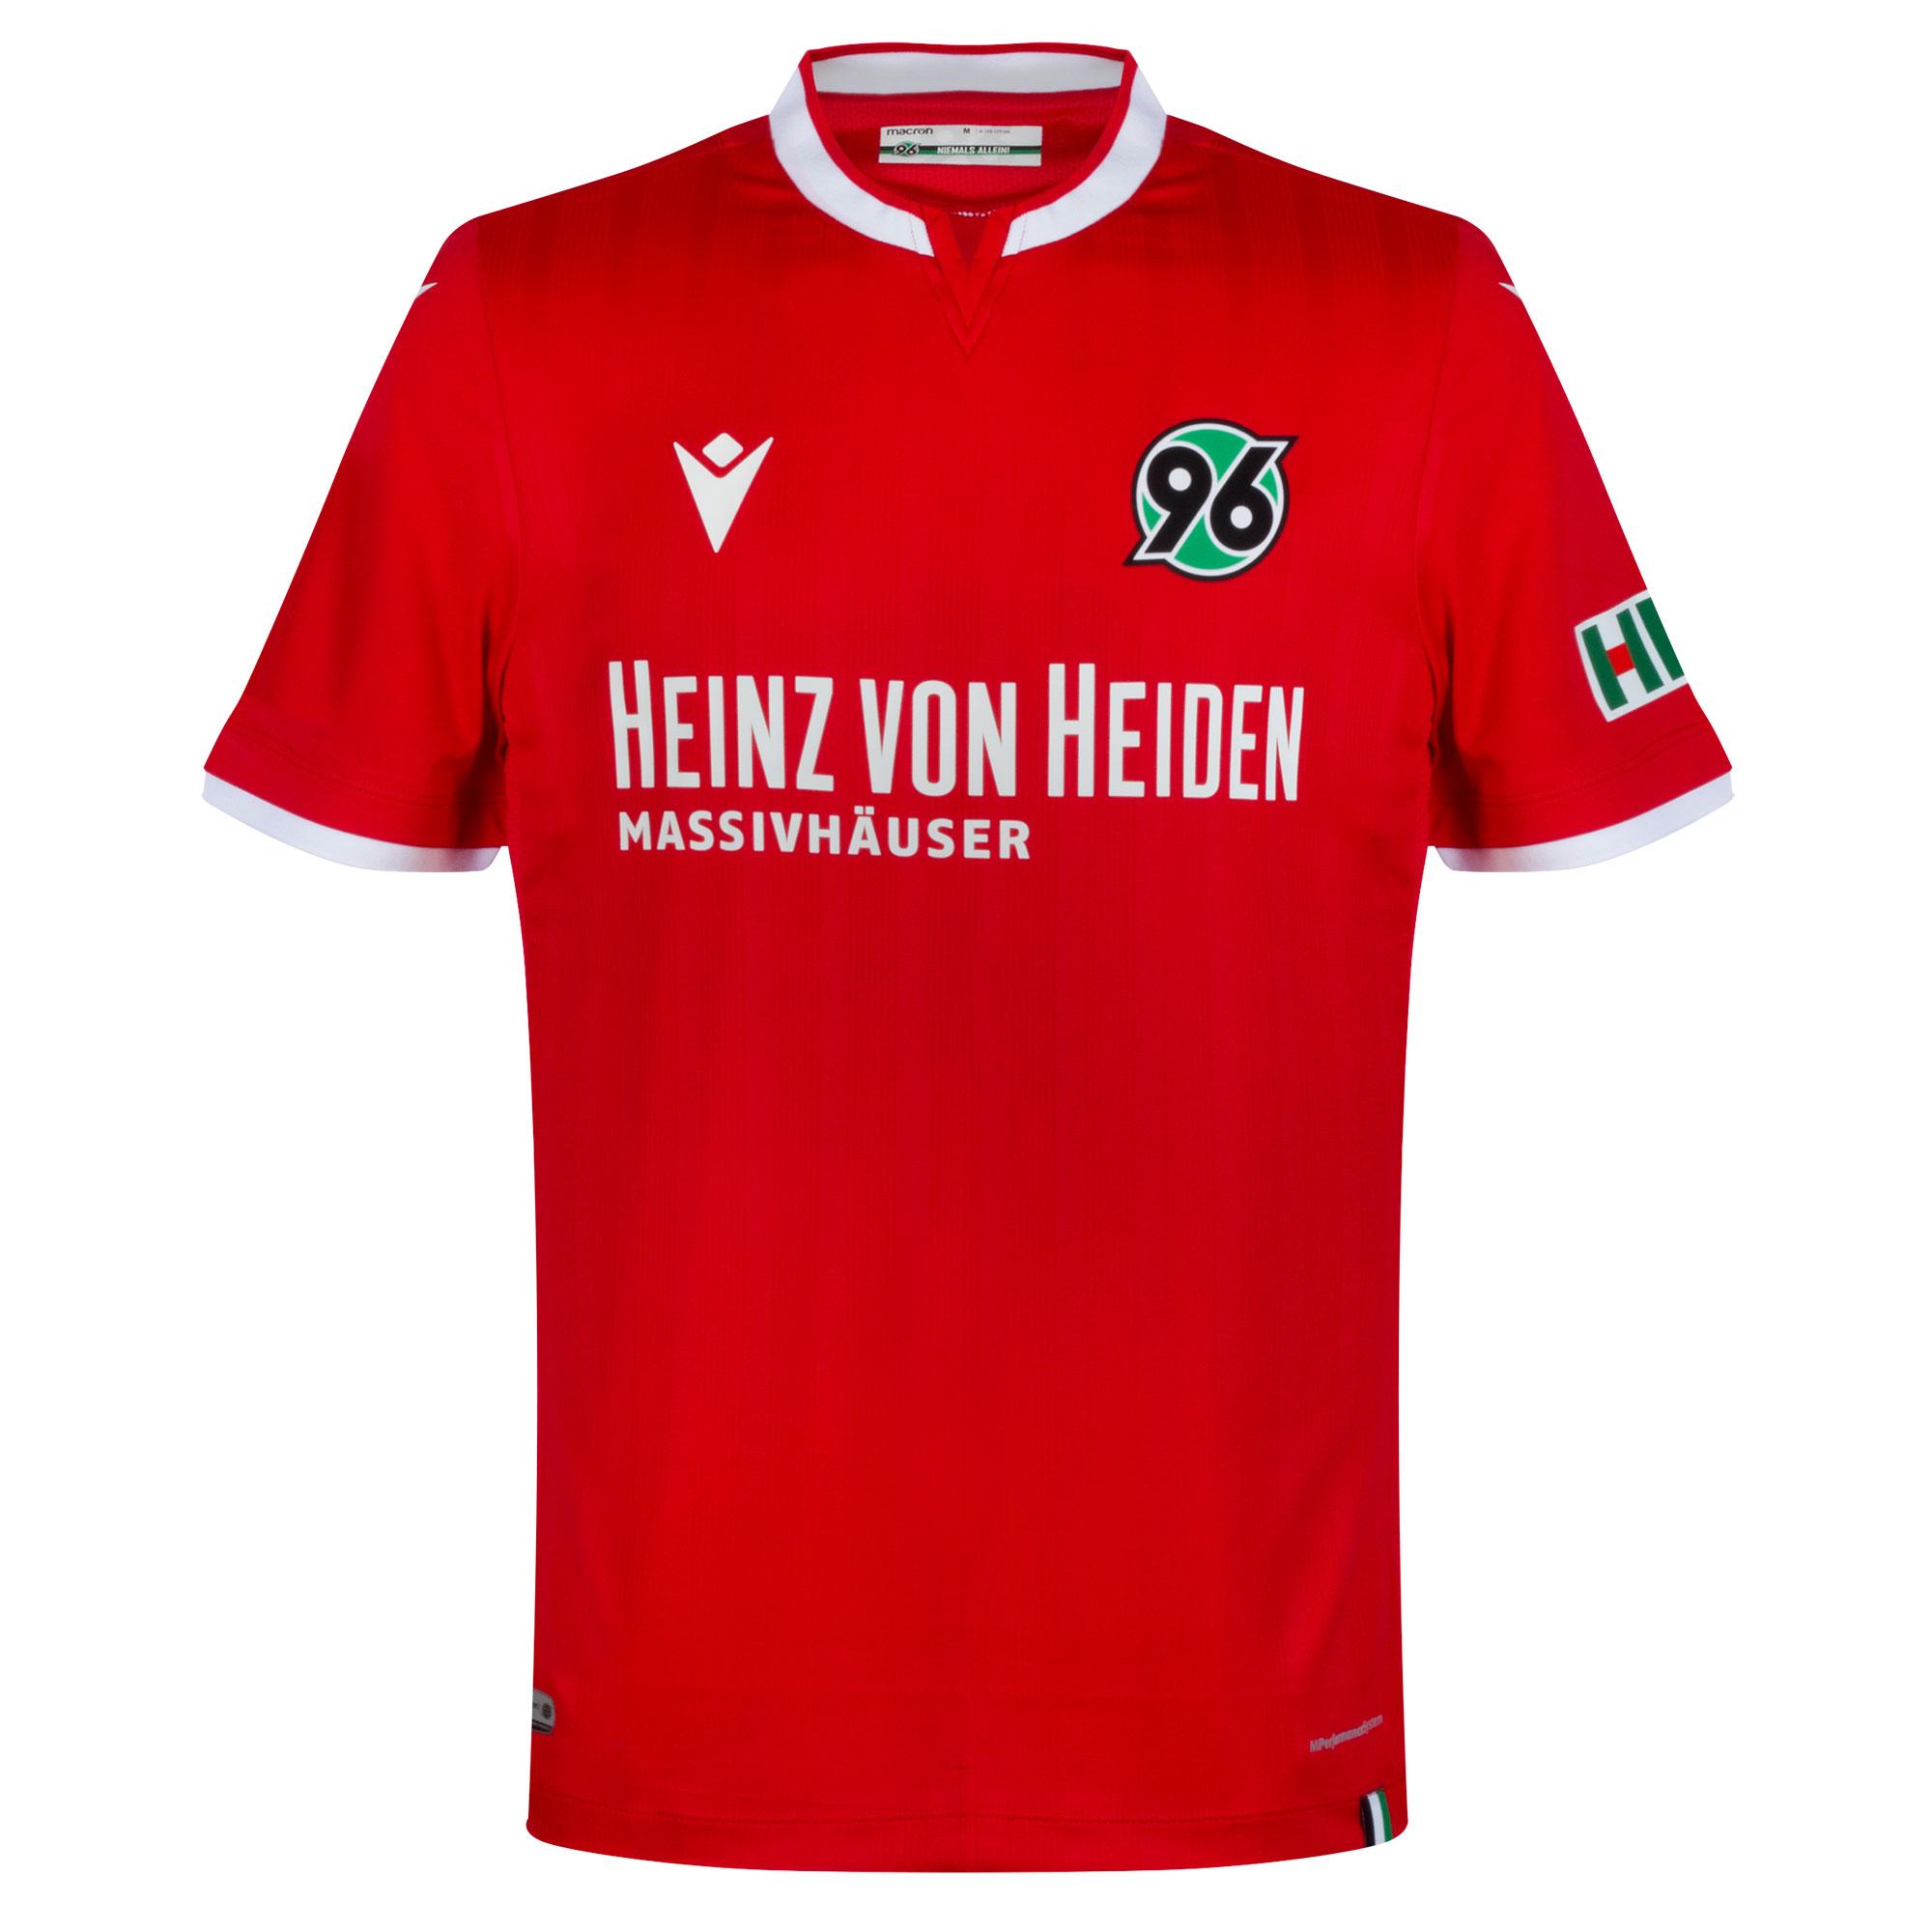 Hannover 96 home shirt